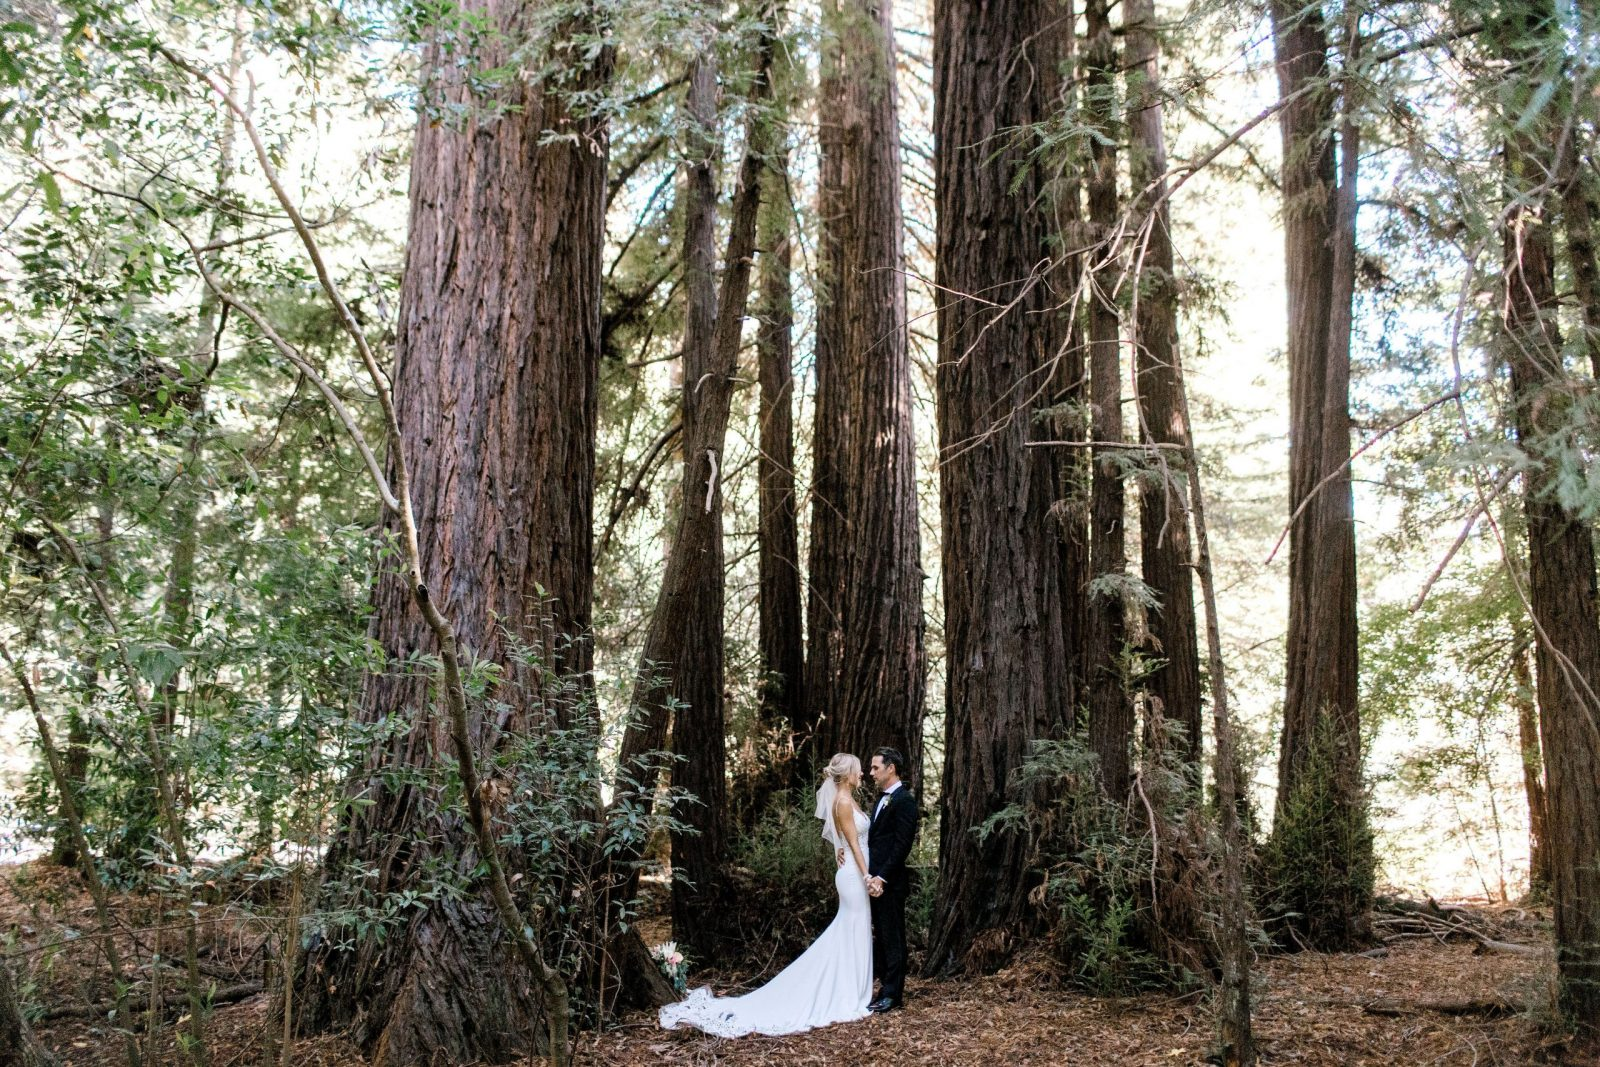 18-10-Brittany-Anthony-Big-Sur-Elopement-Wedding-Photographer-Zeeqk-Barkis-77 (1)